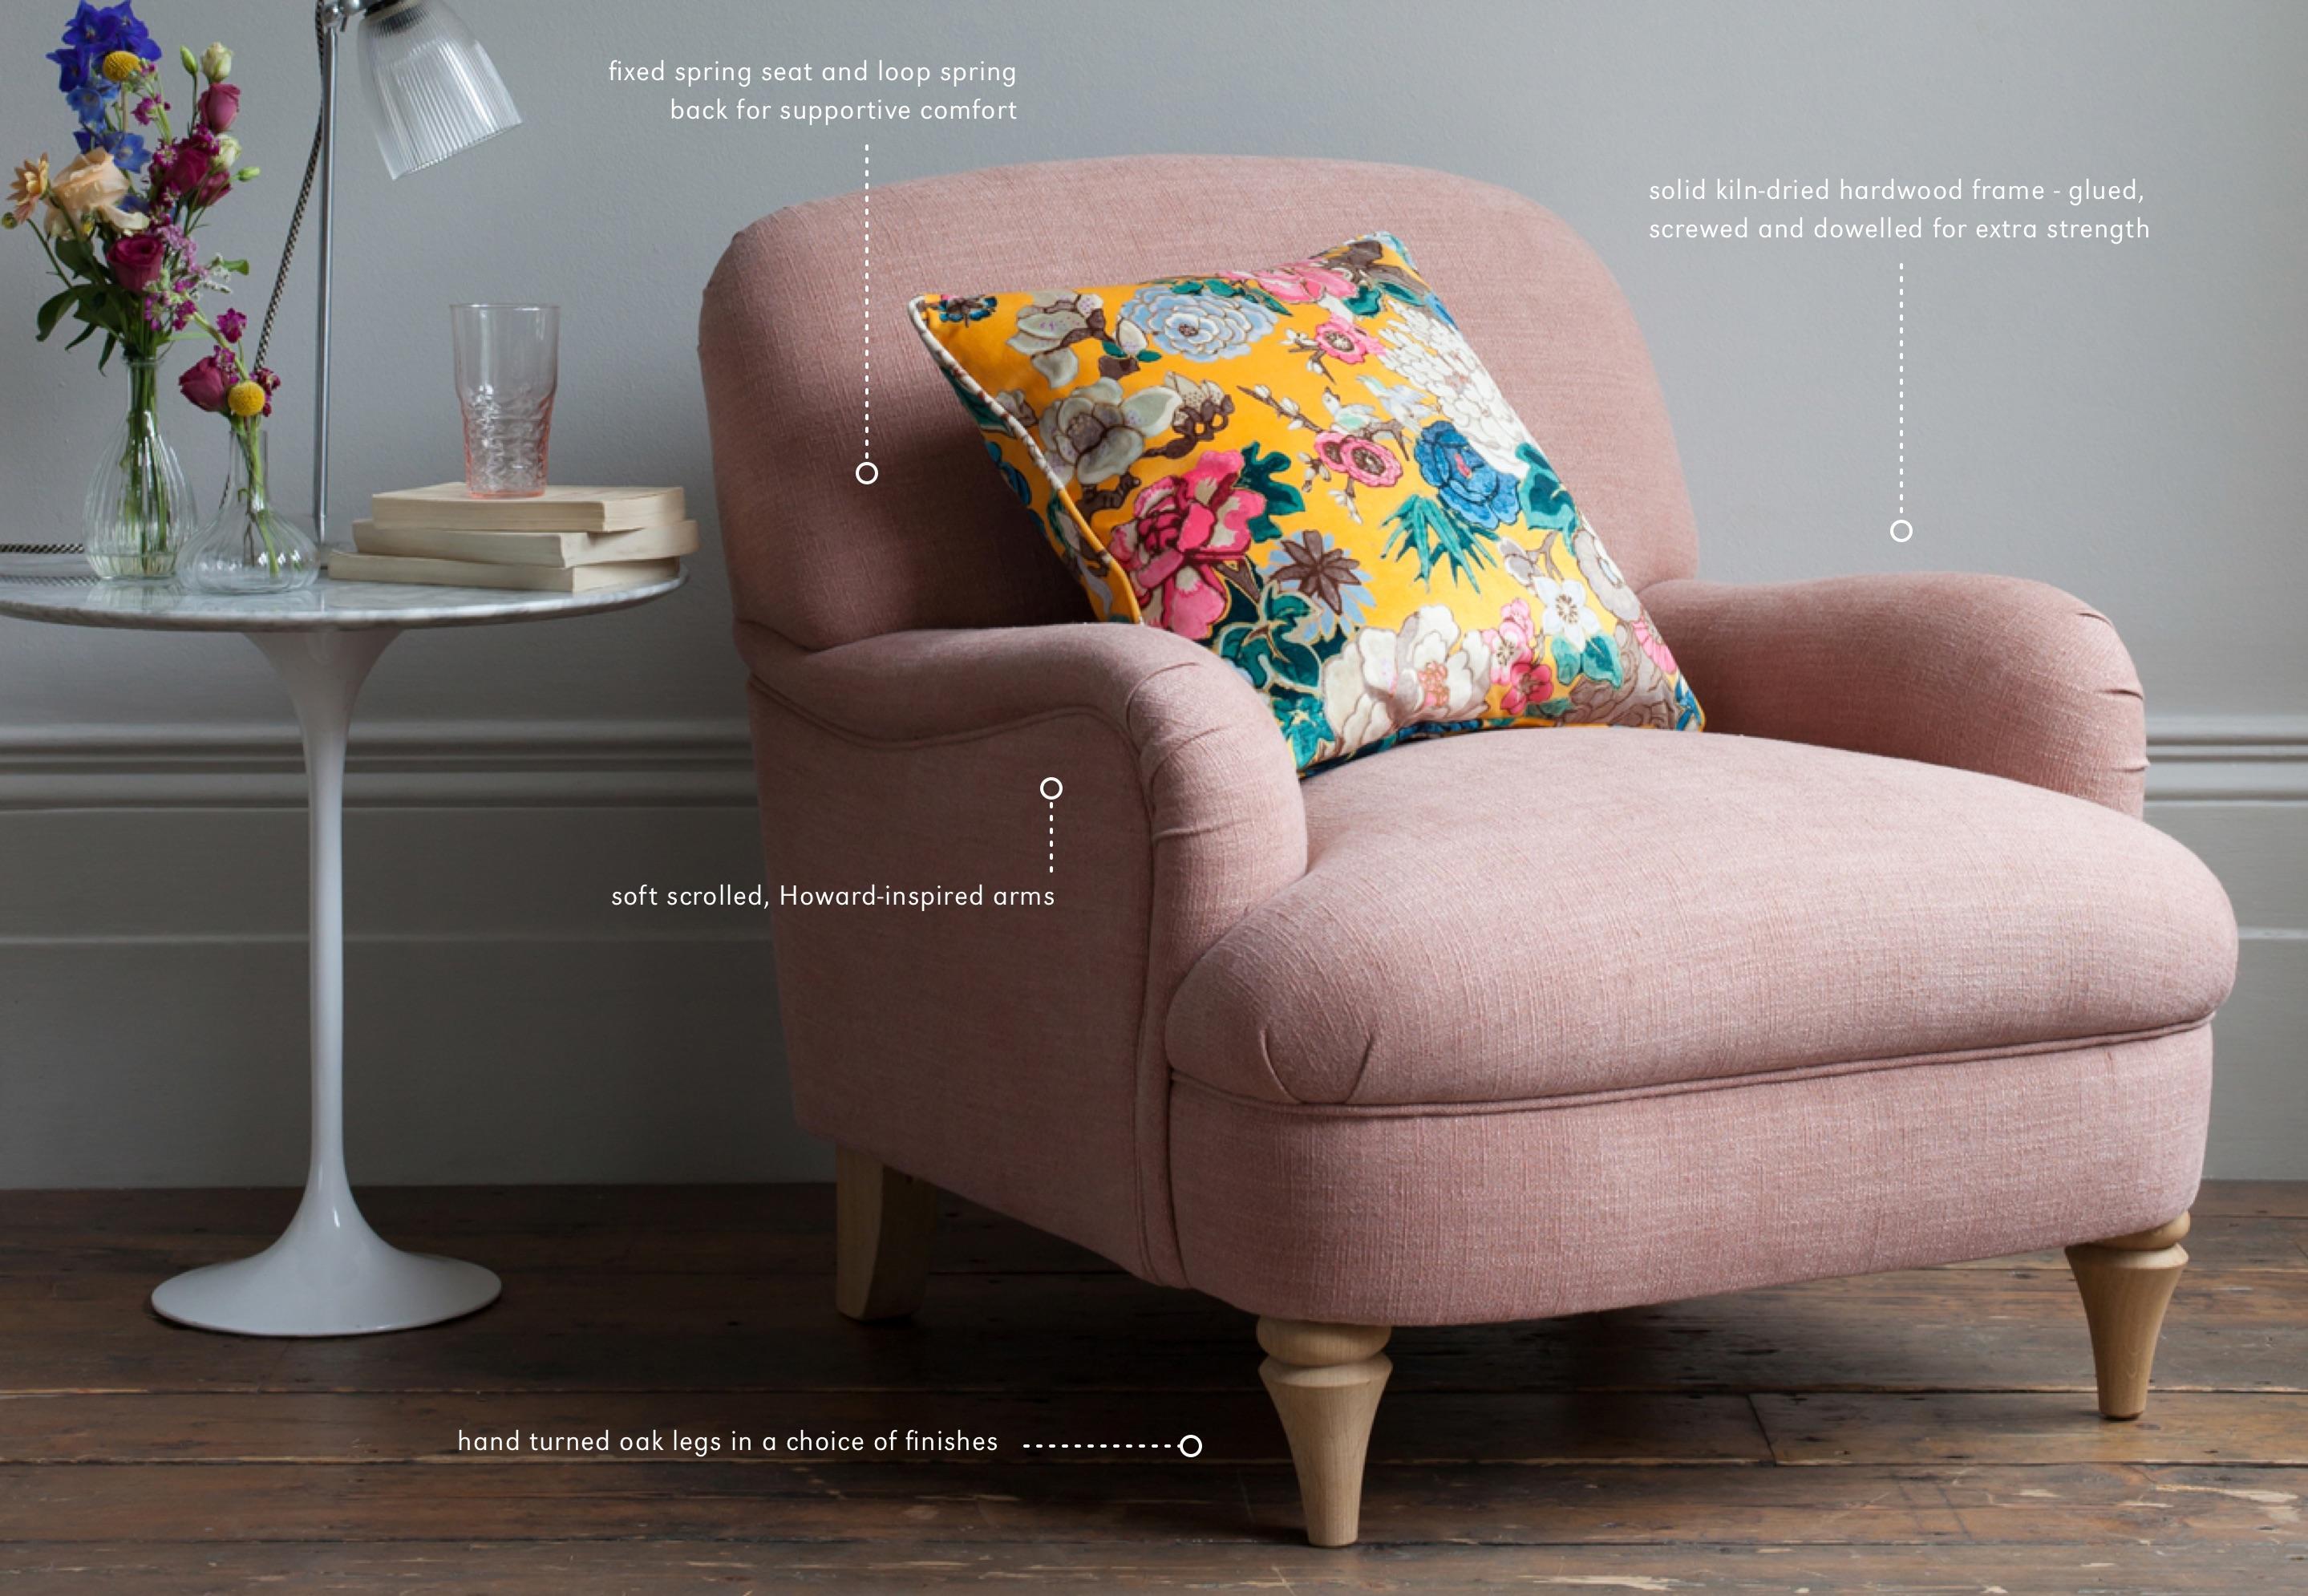 Sofa Key Features